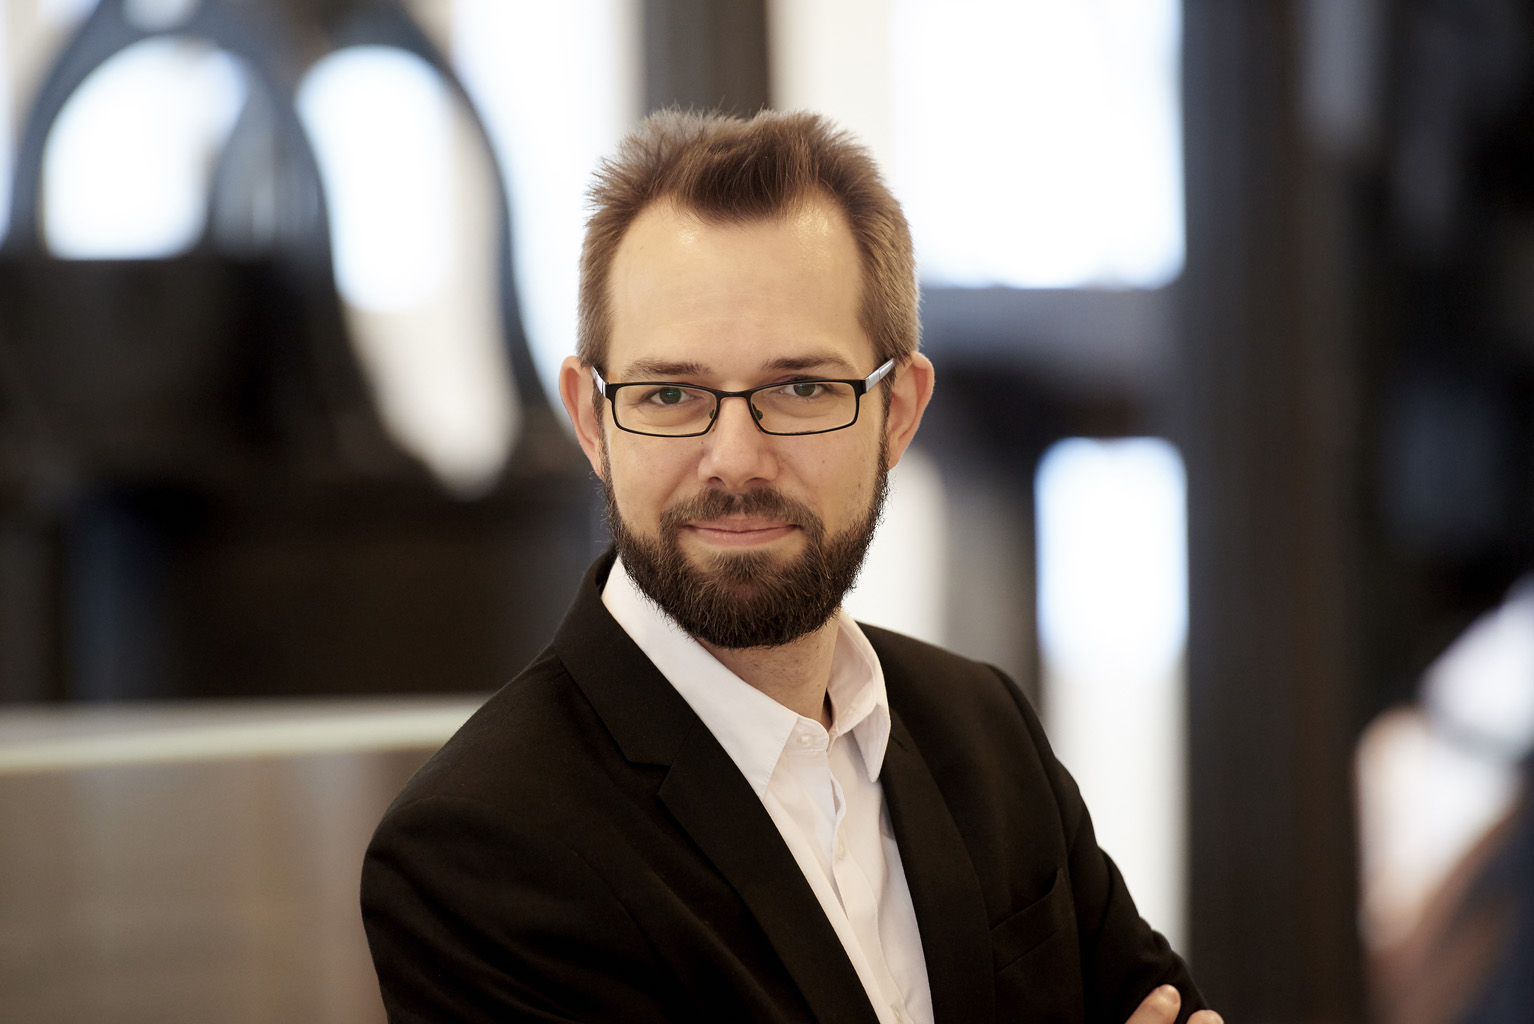 Roman Gerhardt